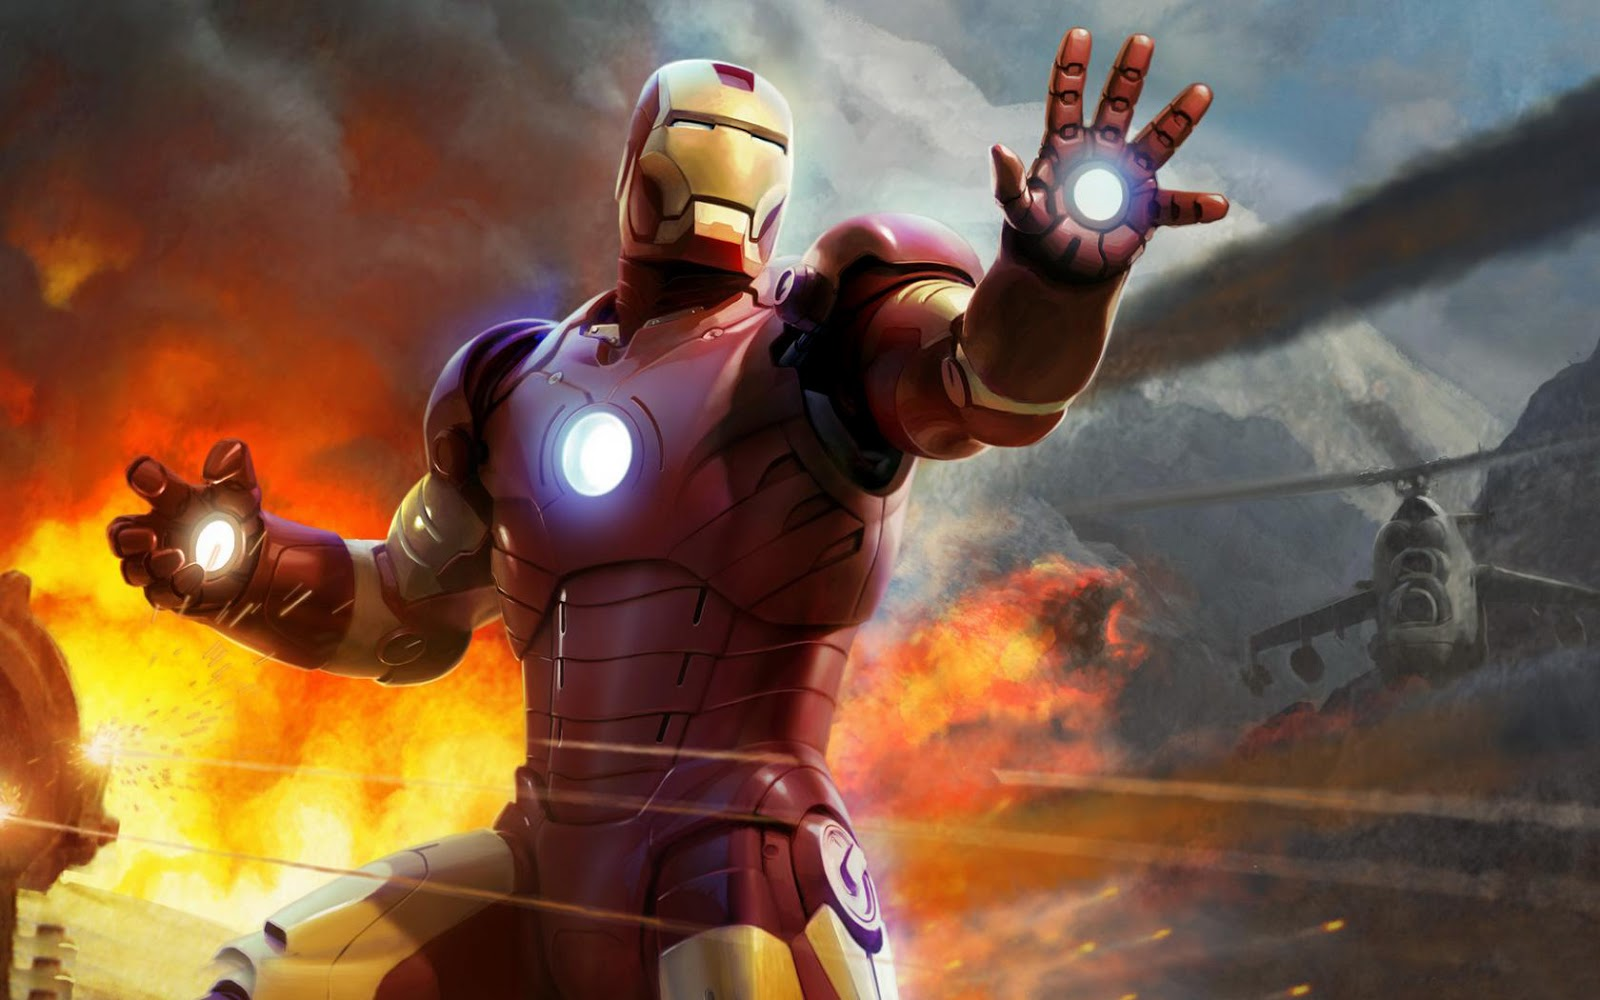 Wonderful Wallpapers Iron Man 3 Hd Wallpapers